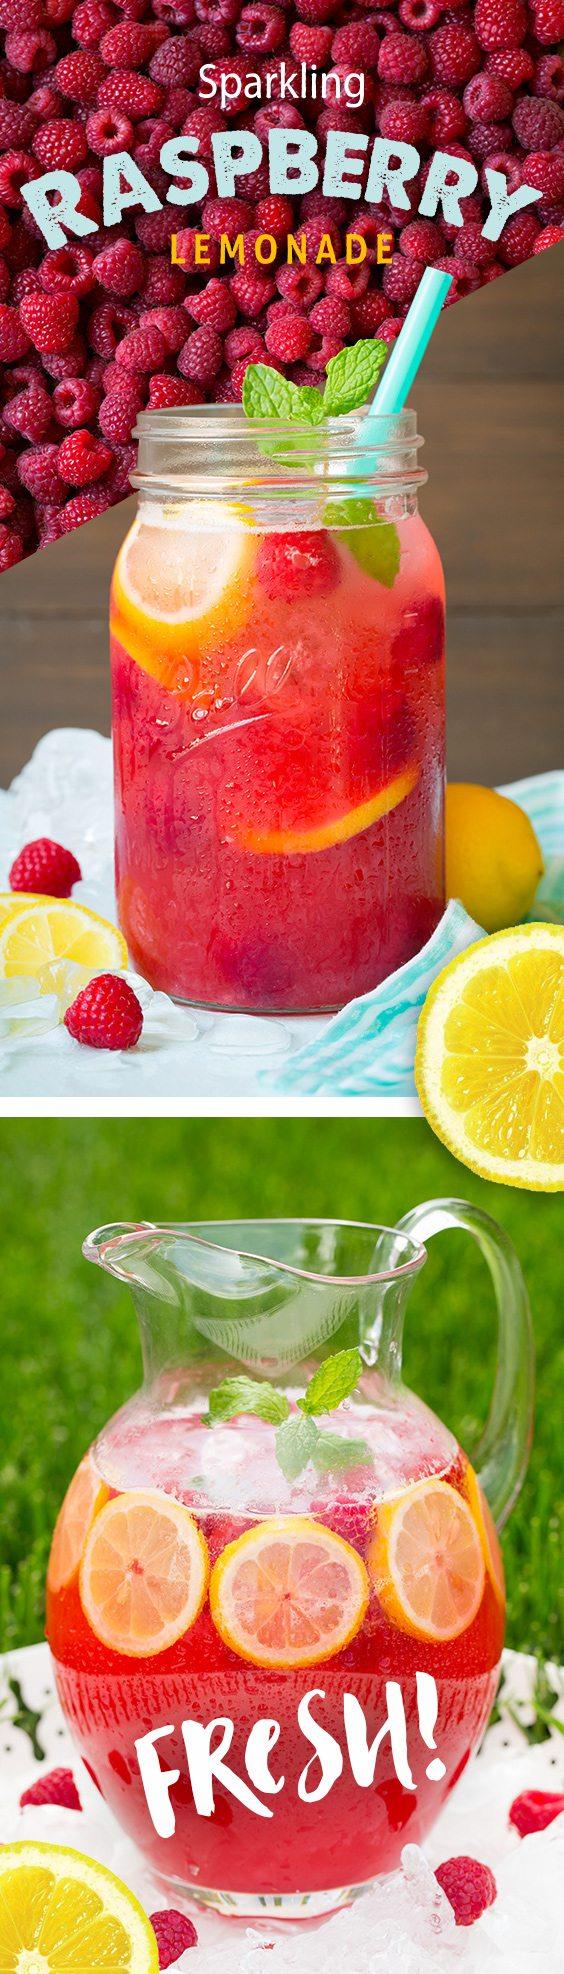 Aug_Cooking-Classy_Pin_Raspberrry_lemonade (1)